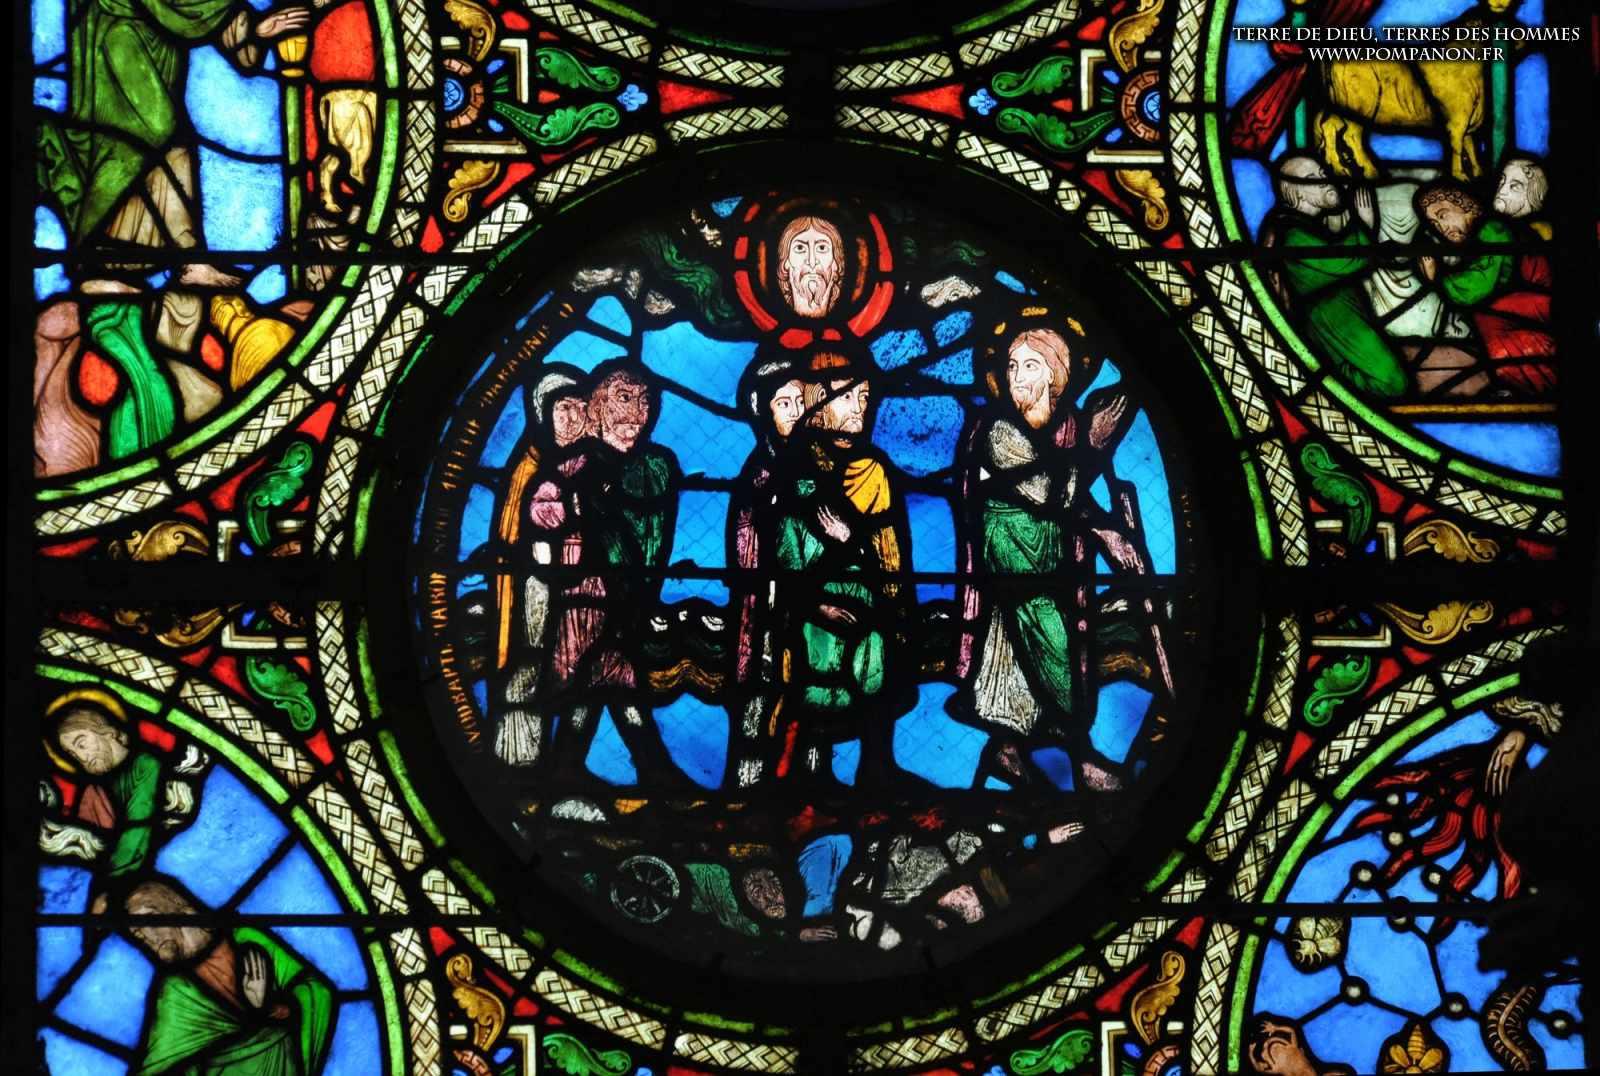 Les vitraux  du XIIIéme siècle . 5043eefca928e